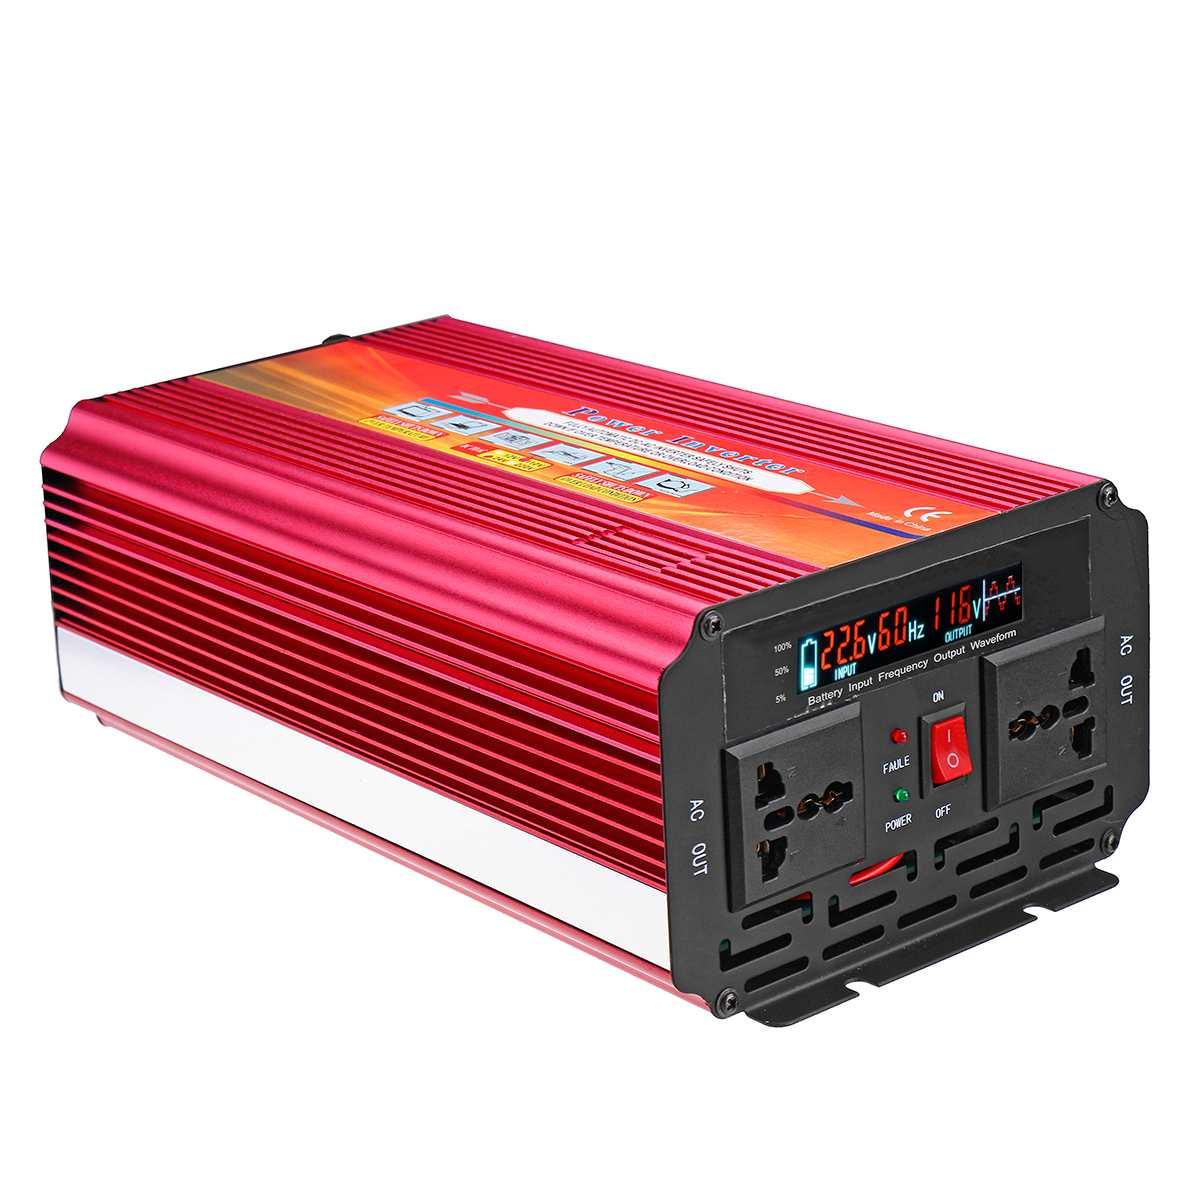 Inversor 12V 220 V/2000/3000 W/4000 W transformador de tensión del convertidor DC 12V a AC 220V inversor del coche 12 V/24 V a 110 V/220 V LCD